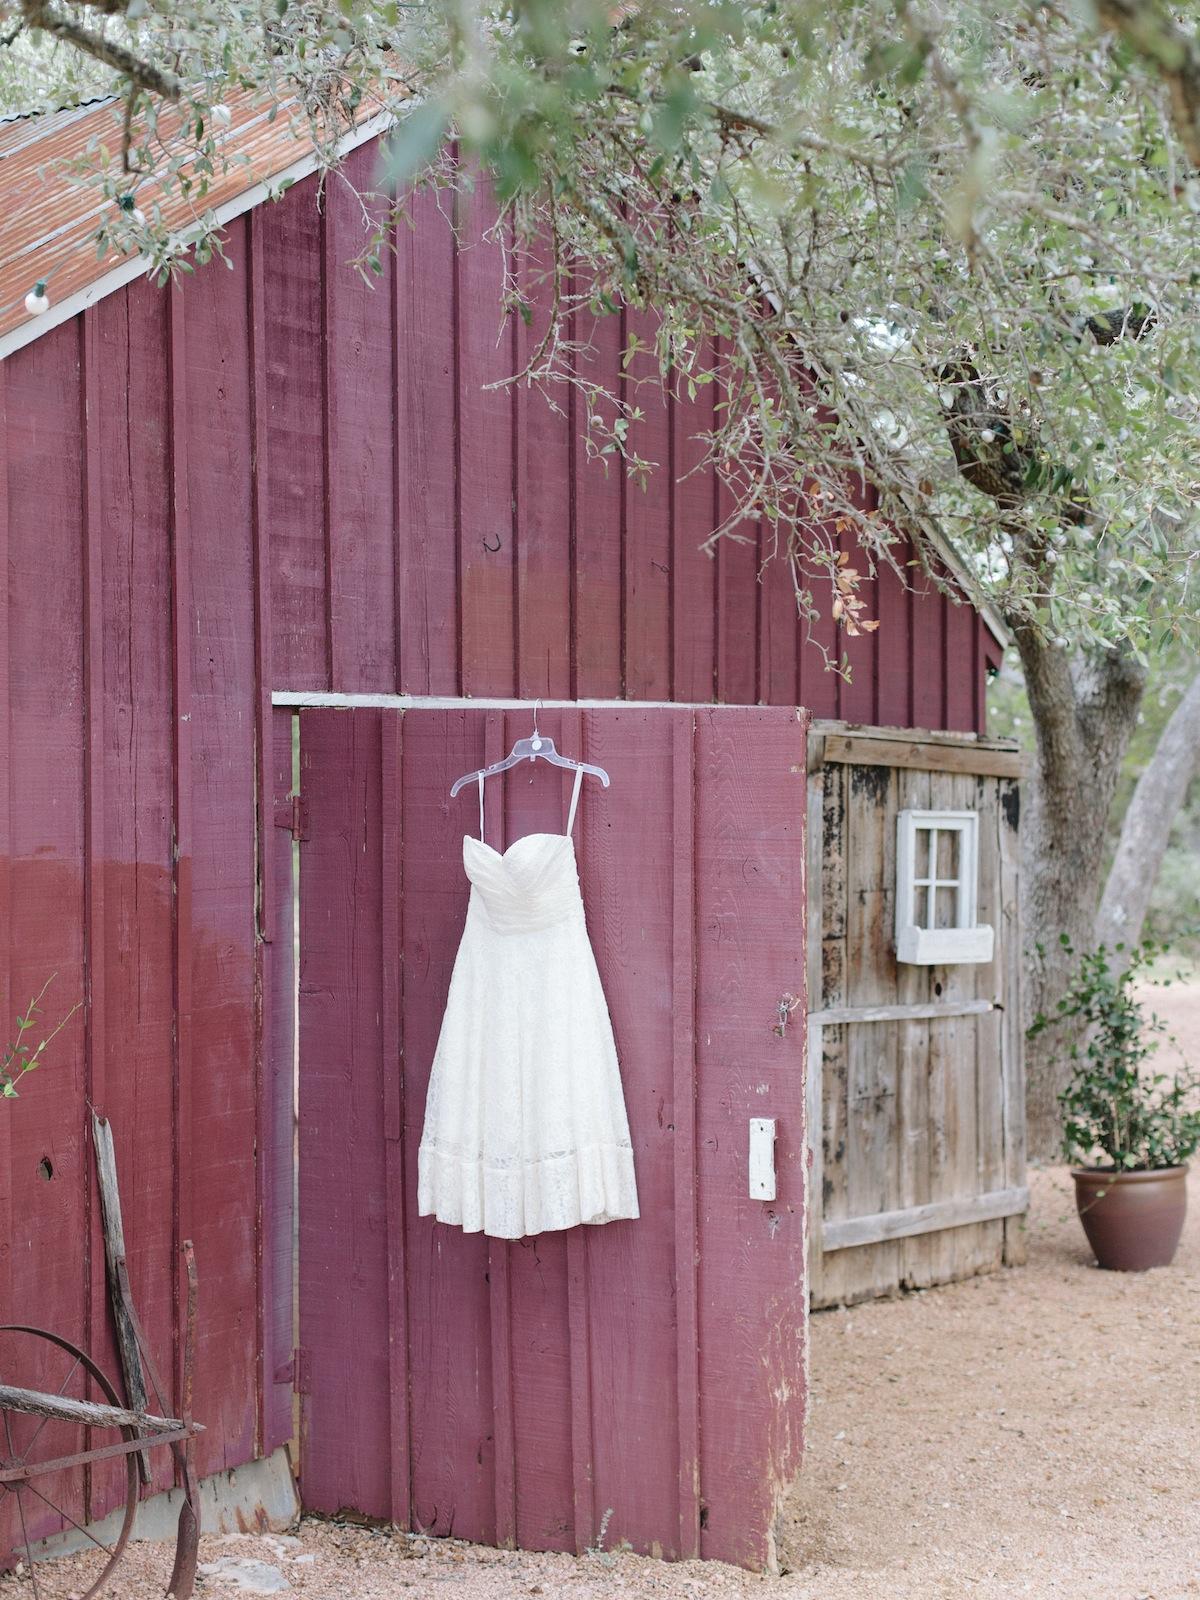 Austin-Wedding-Photographers-Photography-Wildfower-Barn-3.jpg